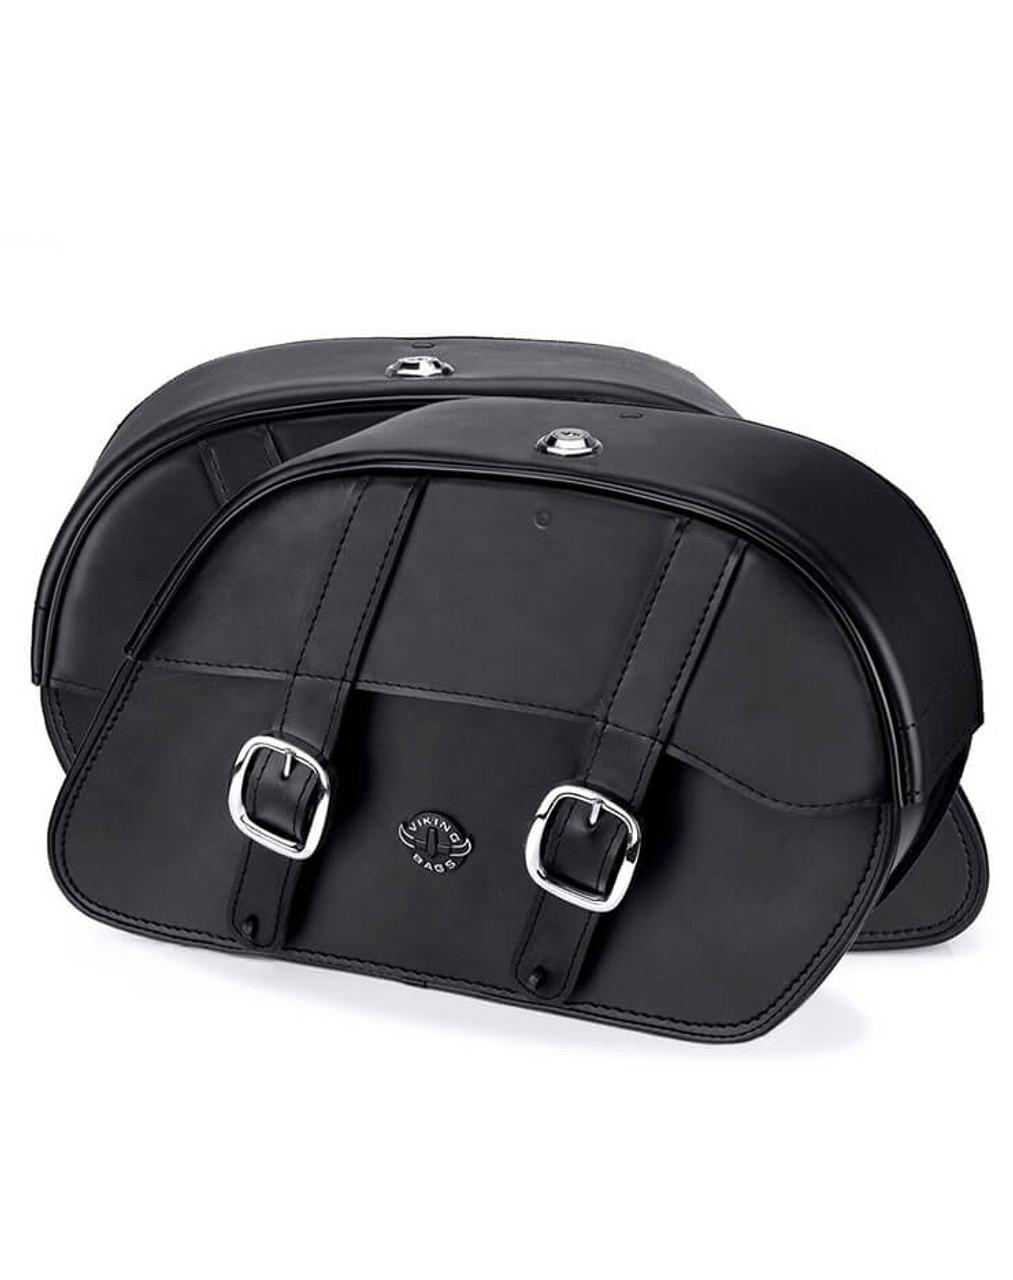 Yamaha Startoliner XV 1900 Medium Slanted Motorcycle Saddlebags Both Bags View